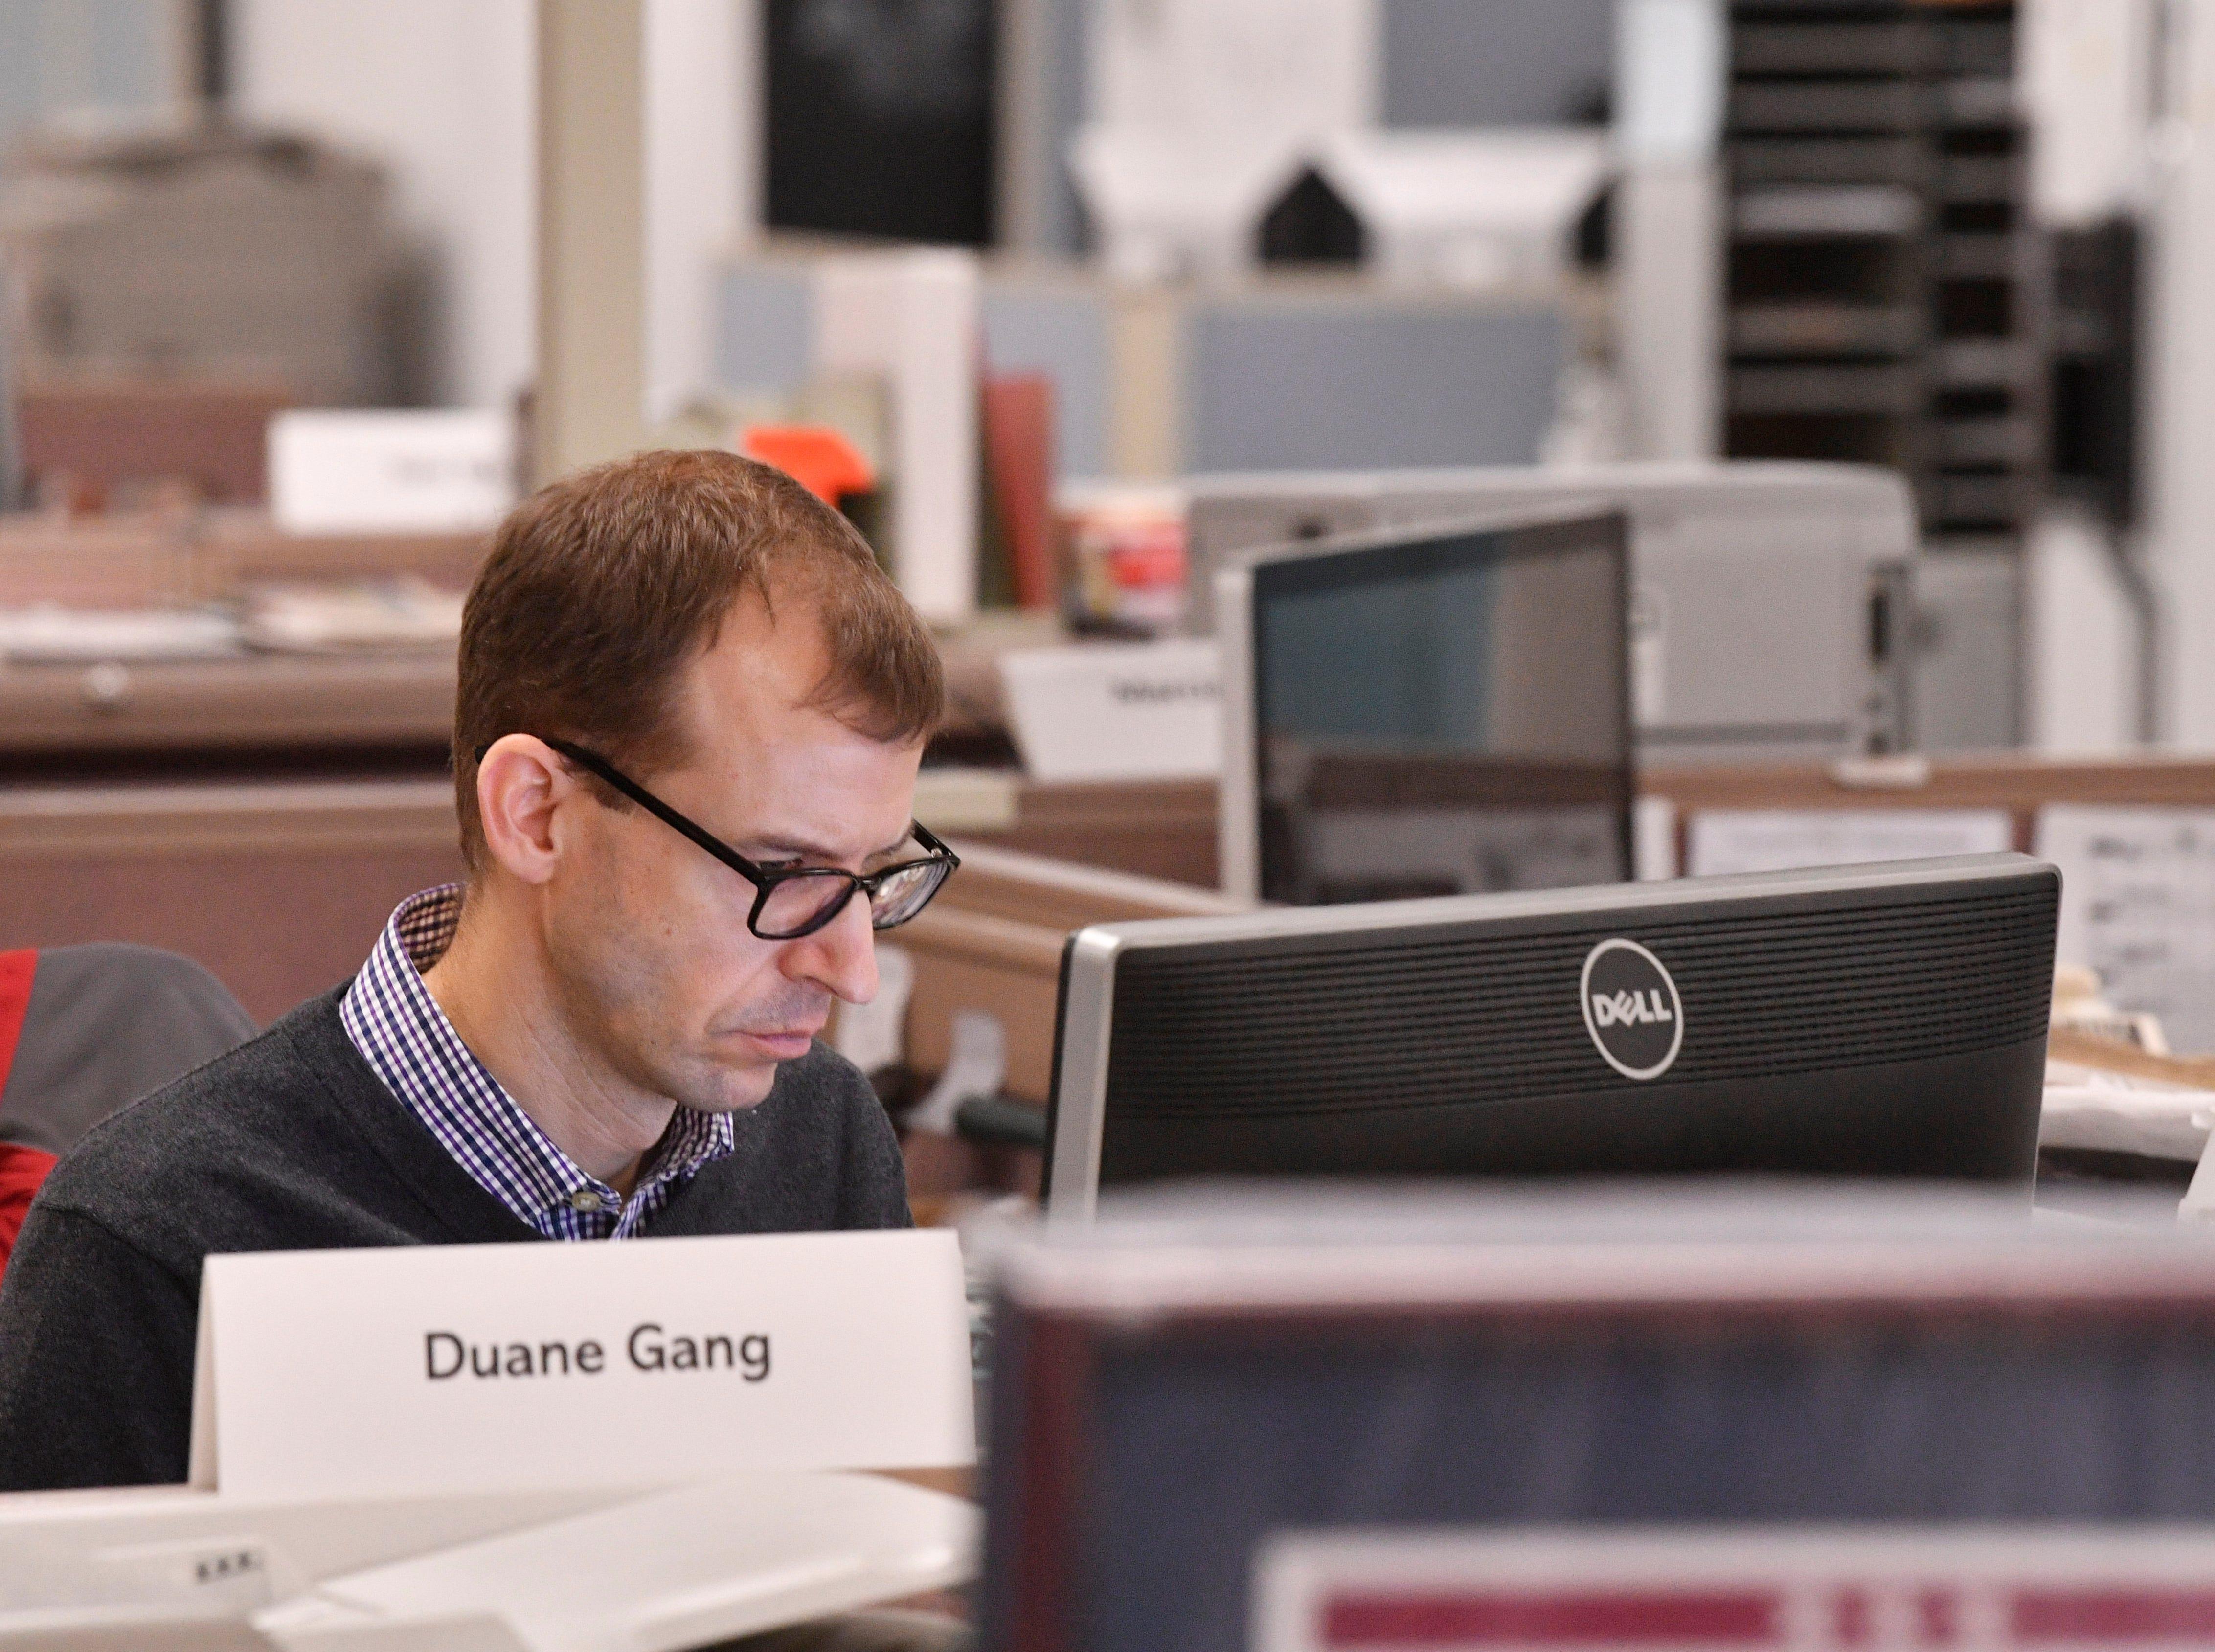 Content Strategist Duane Gang works in The Tennessean newsroom Wednesday, Jan. 2, 2019, in Nashville.